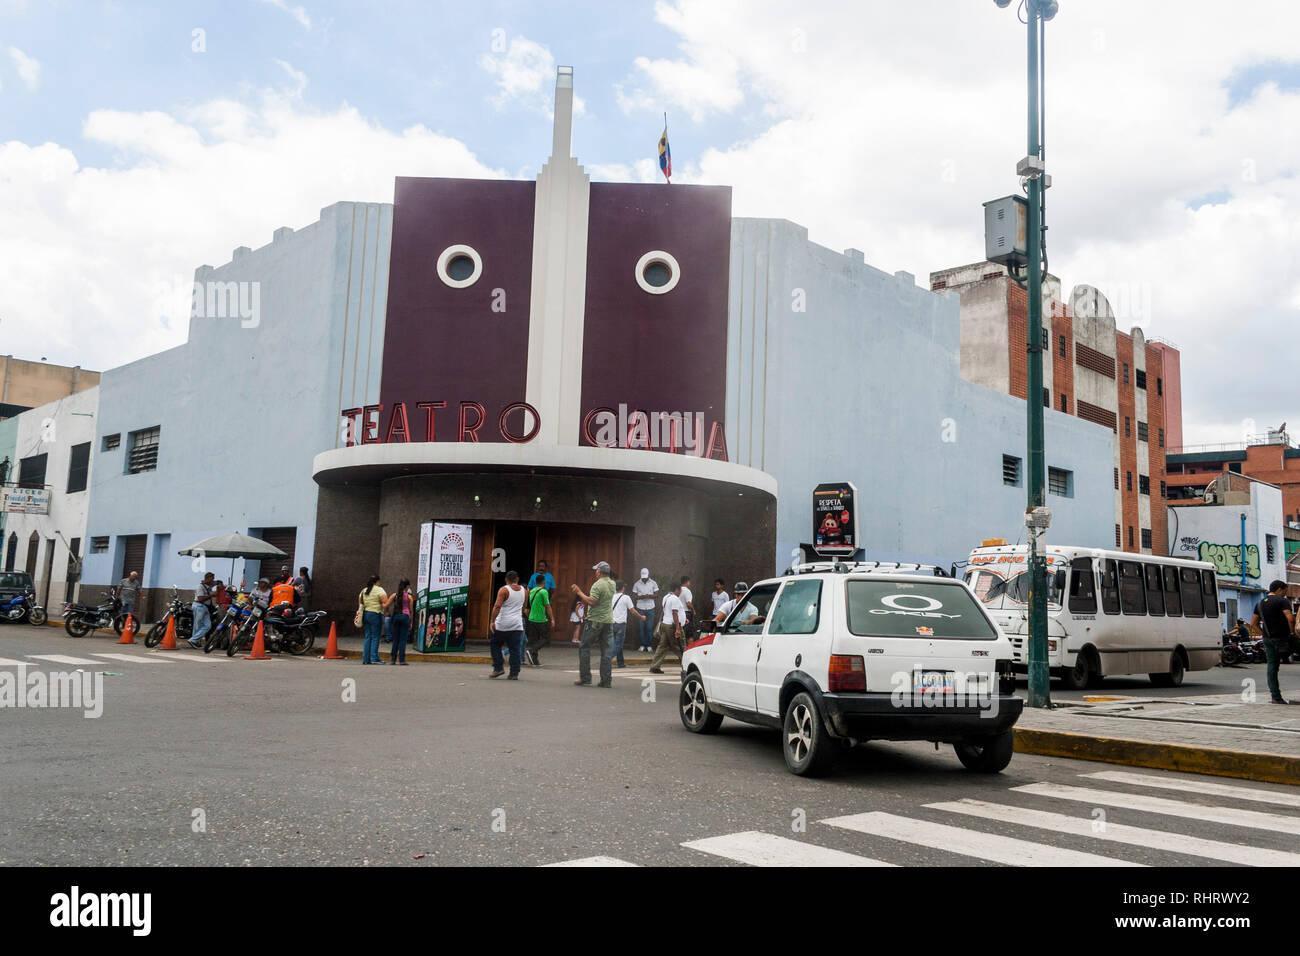 Caracas, Dtto Capital / Venezuela - 03/05/2013. Facade Catia Theater in Catia neighborhood. - Stock Image